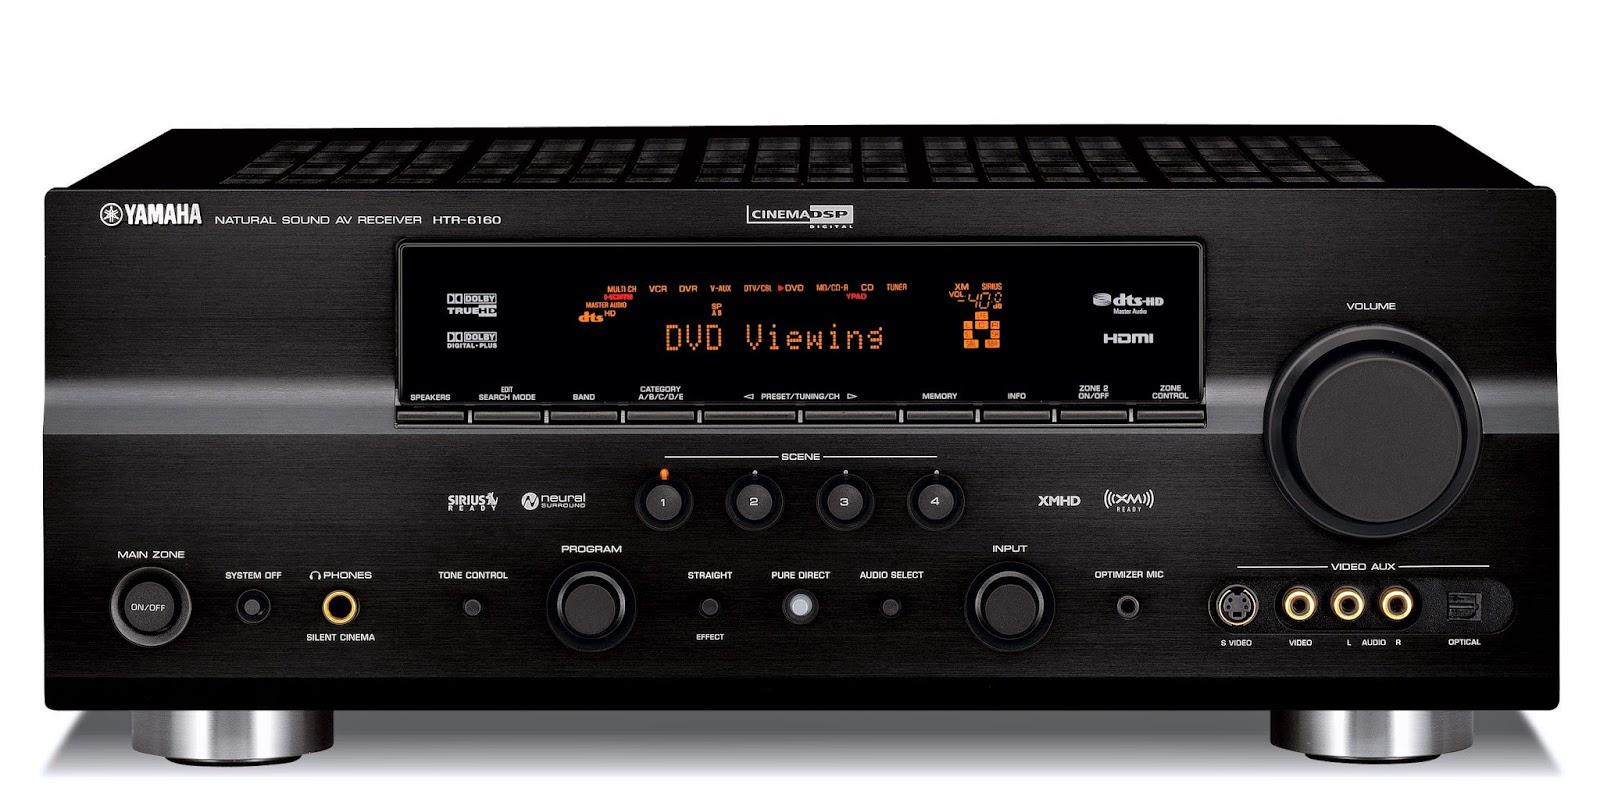 468853-yamaha_htr_5730_51_channel_103_watt_receiver_5_speakers Yamaha Htr 5730